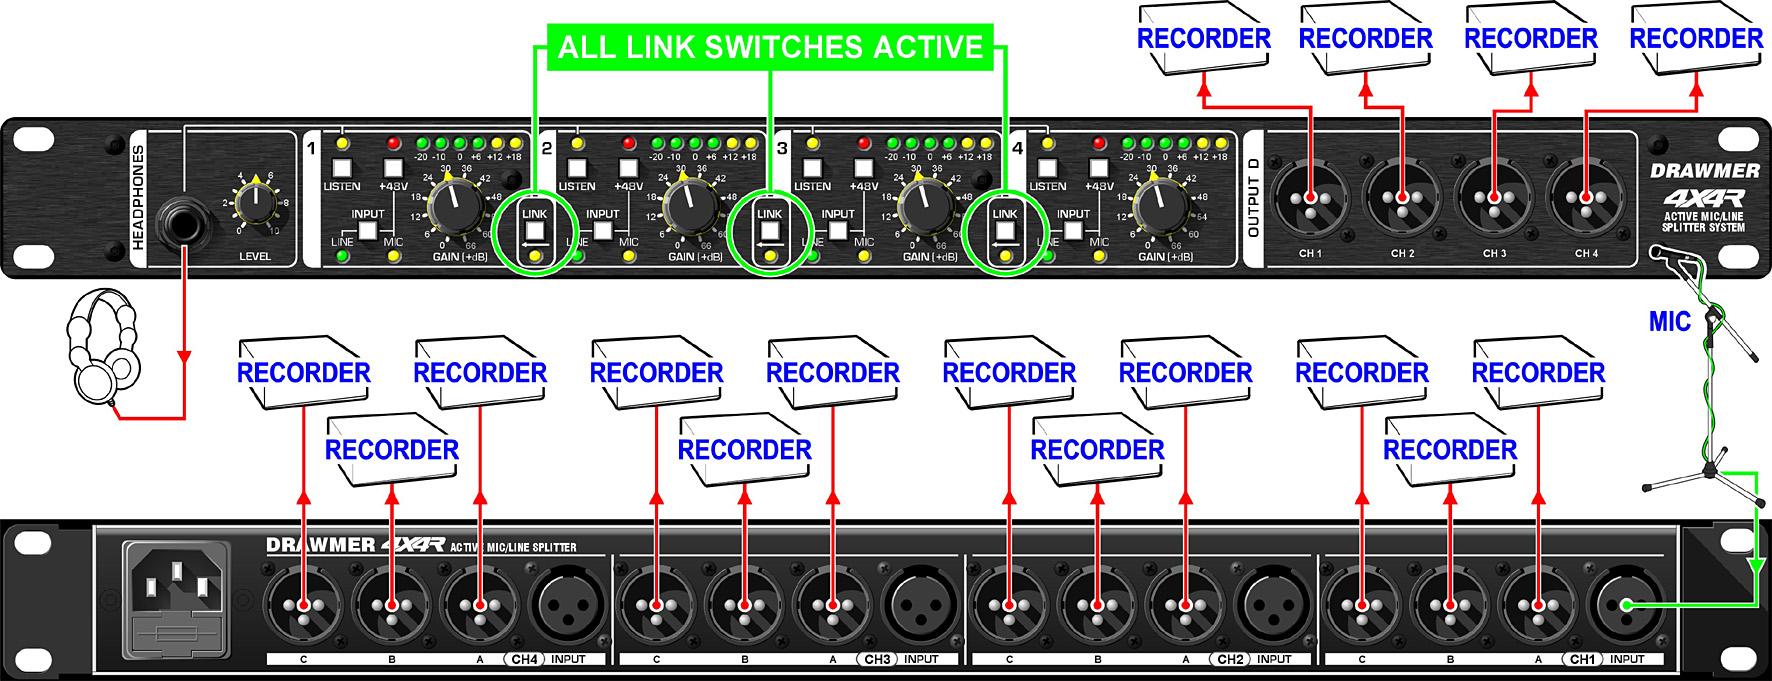 Drawmer Electronics 4x4r